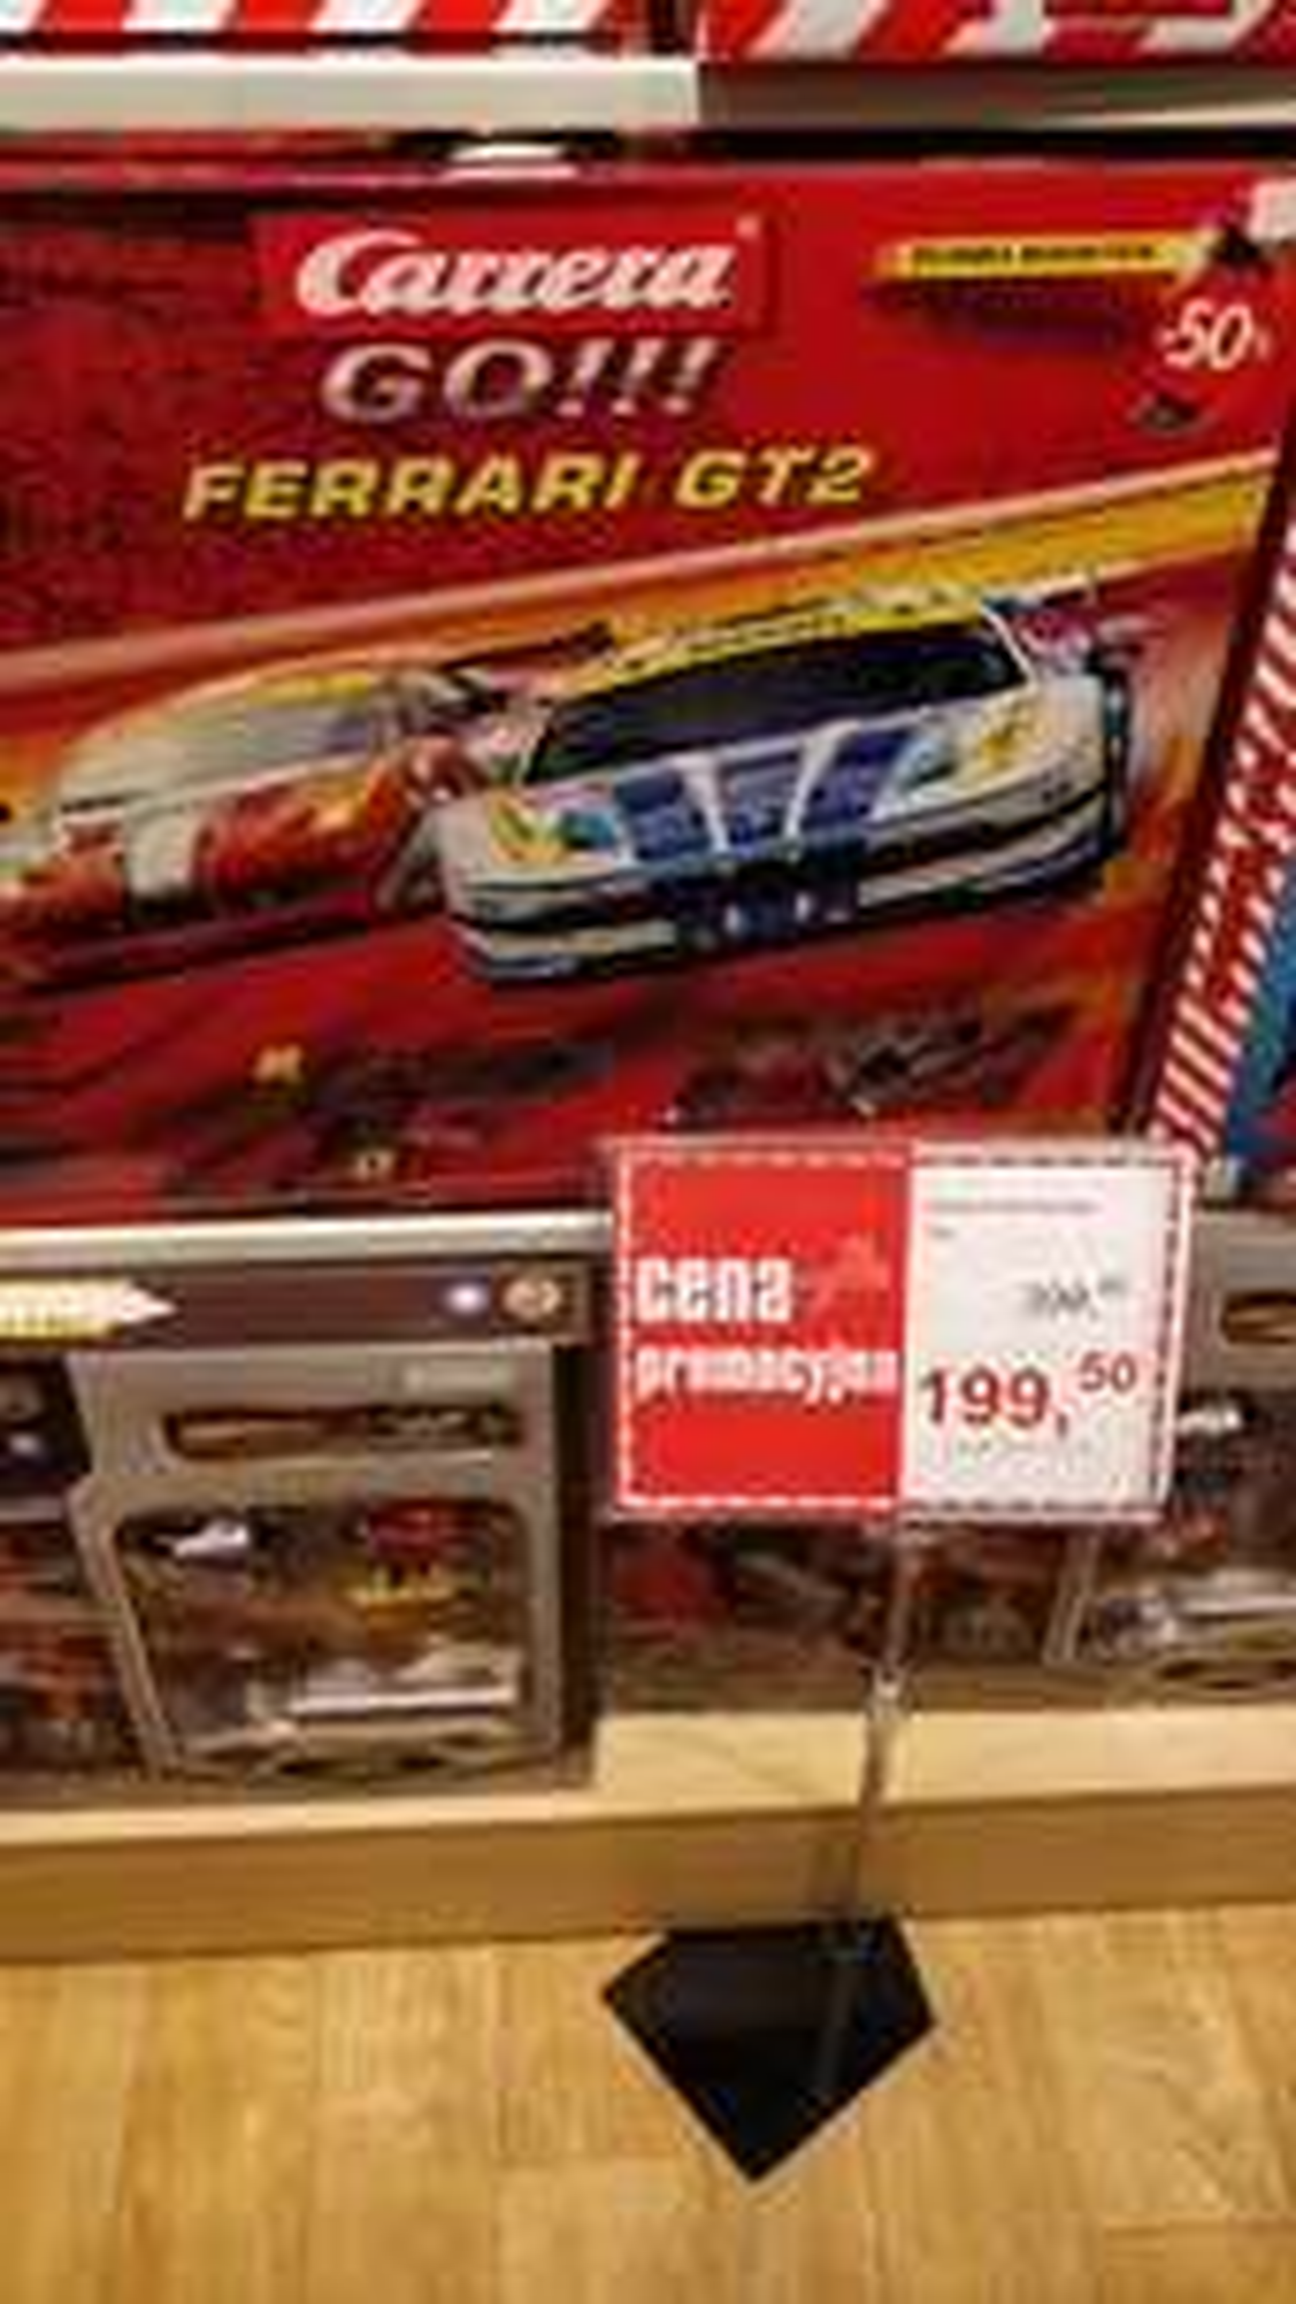 Tor Carrera Ferrari GT2 - Smyk